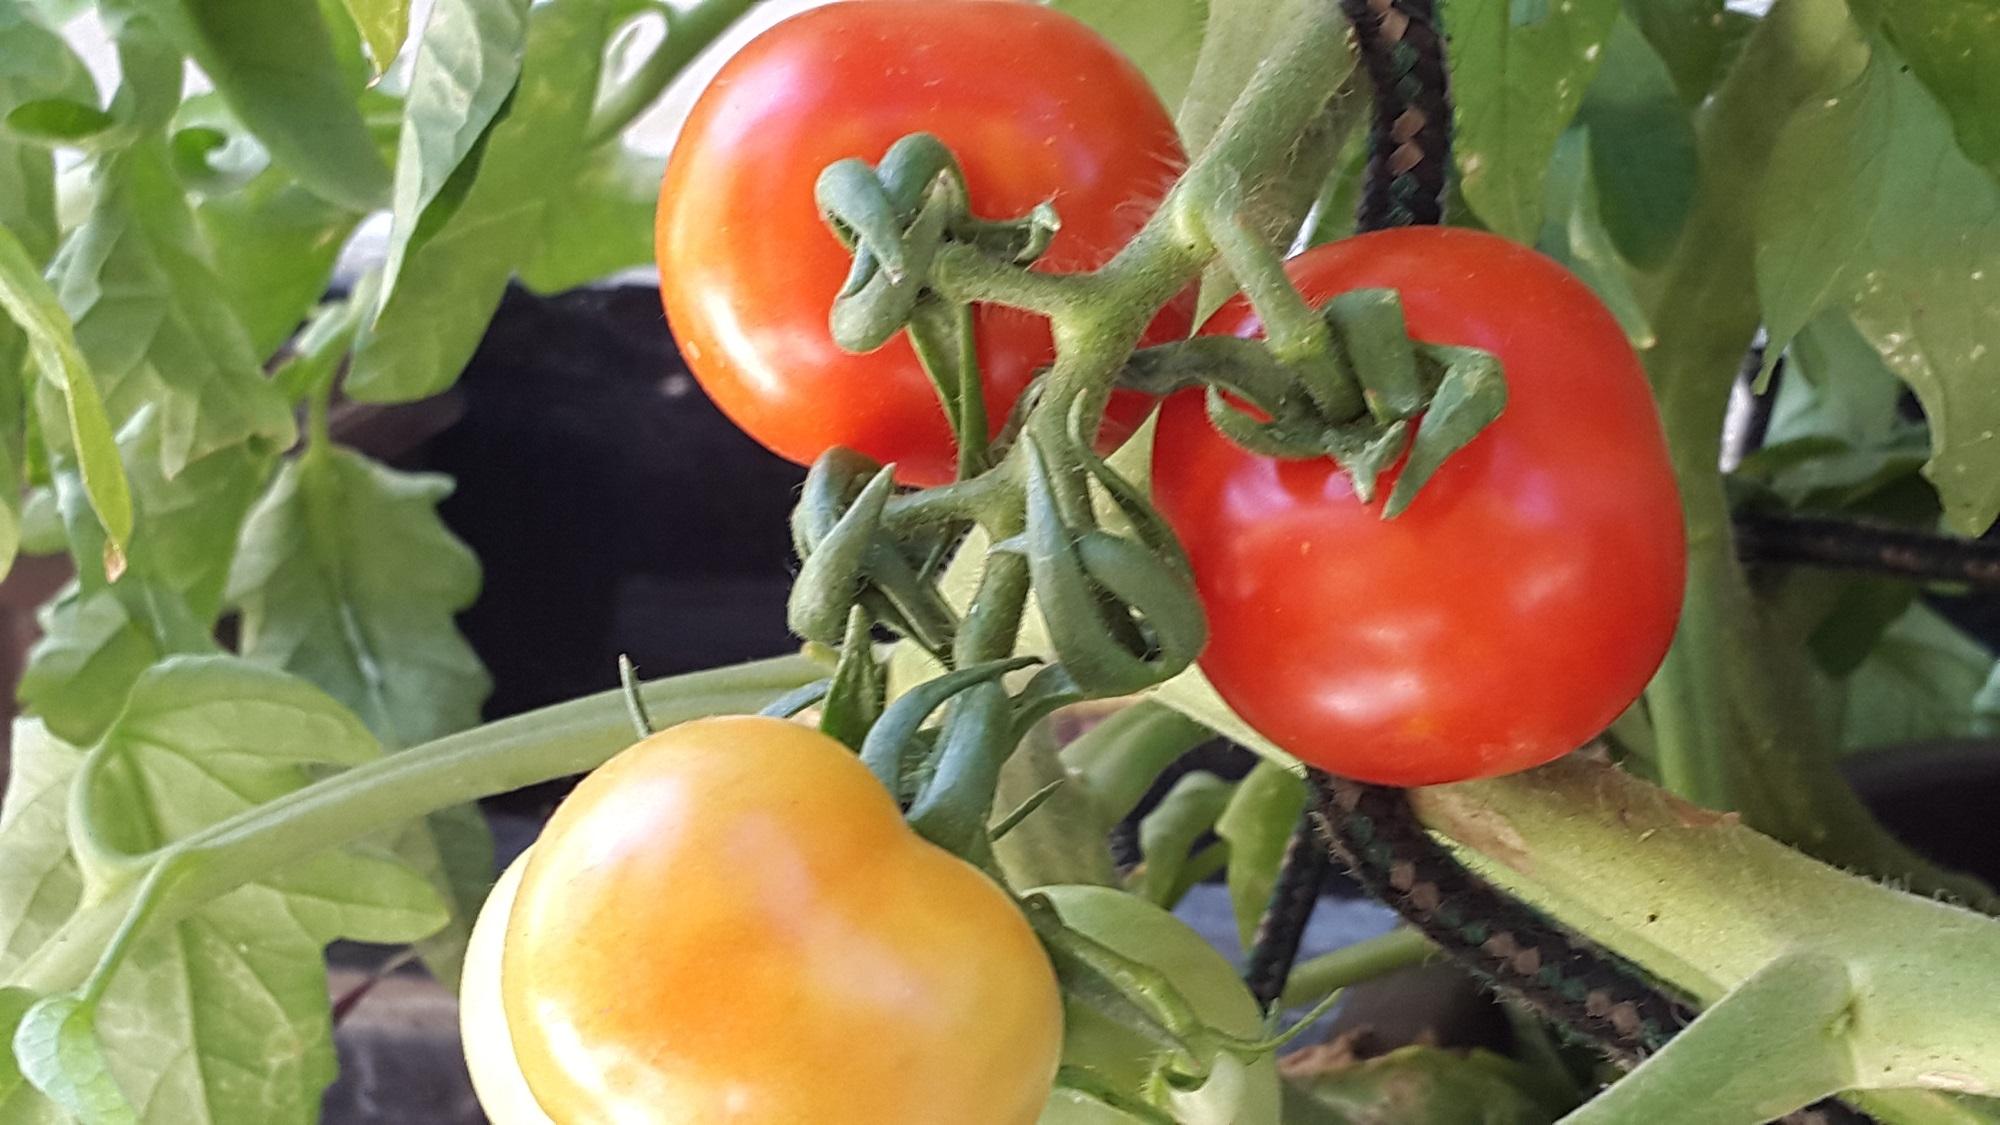 Voici comment vous devez procéder au plantage des tomates  - إليك كيفية زراعة الطماطم في المنزل